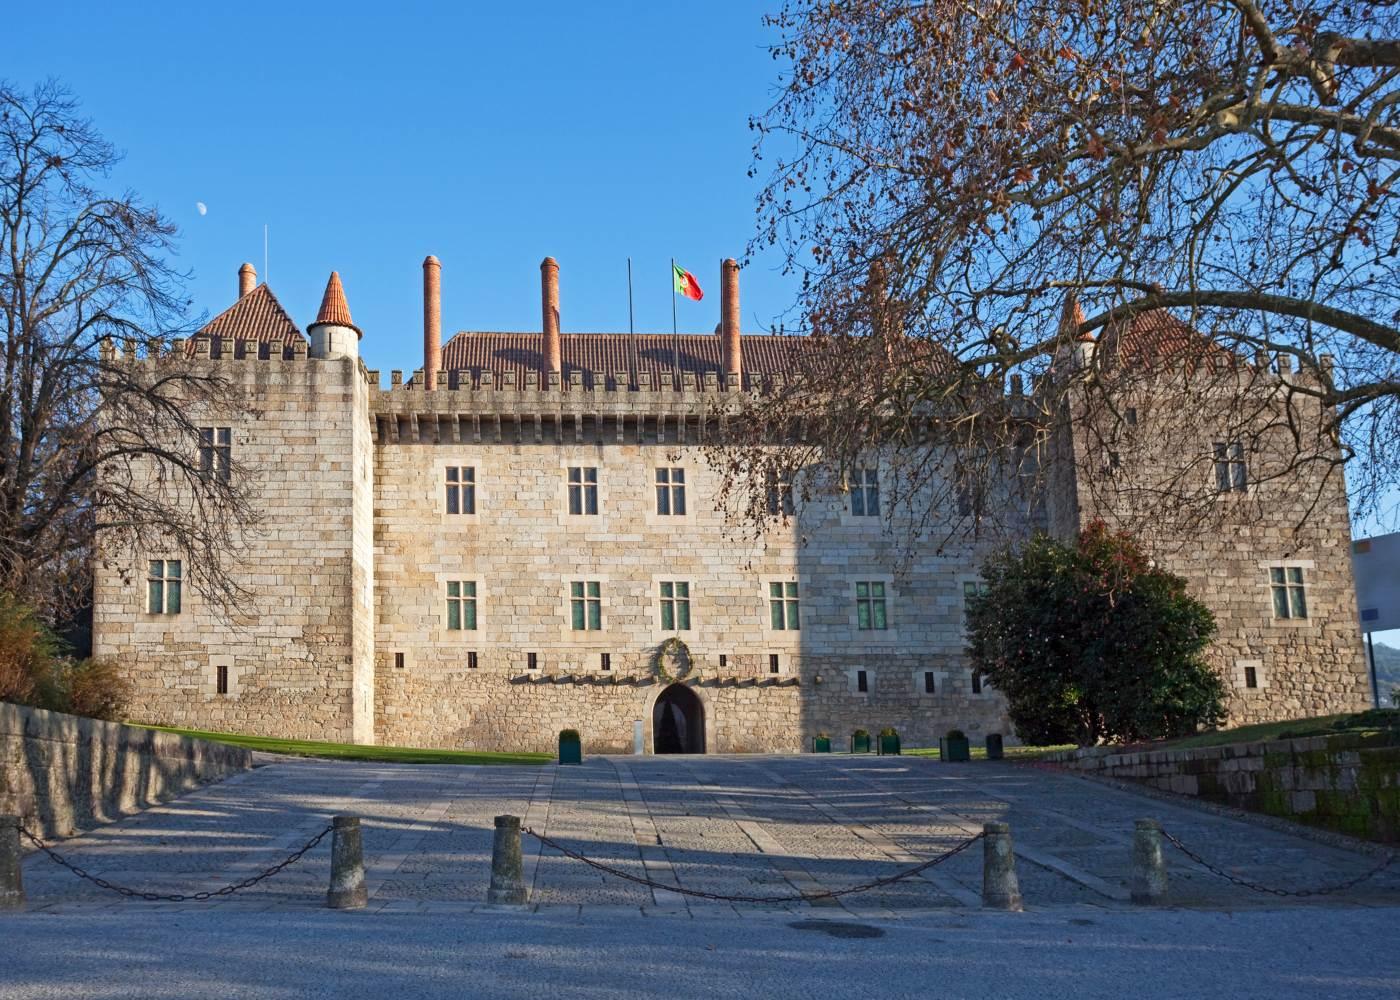 Paço dos Duques de Guimarães